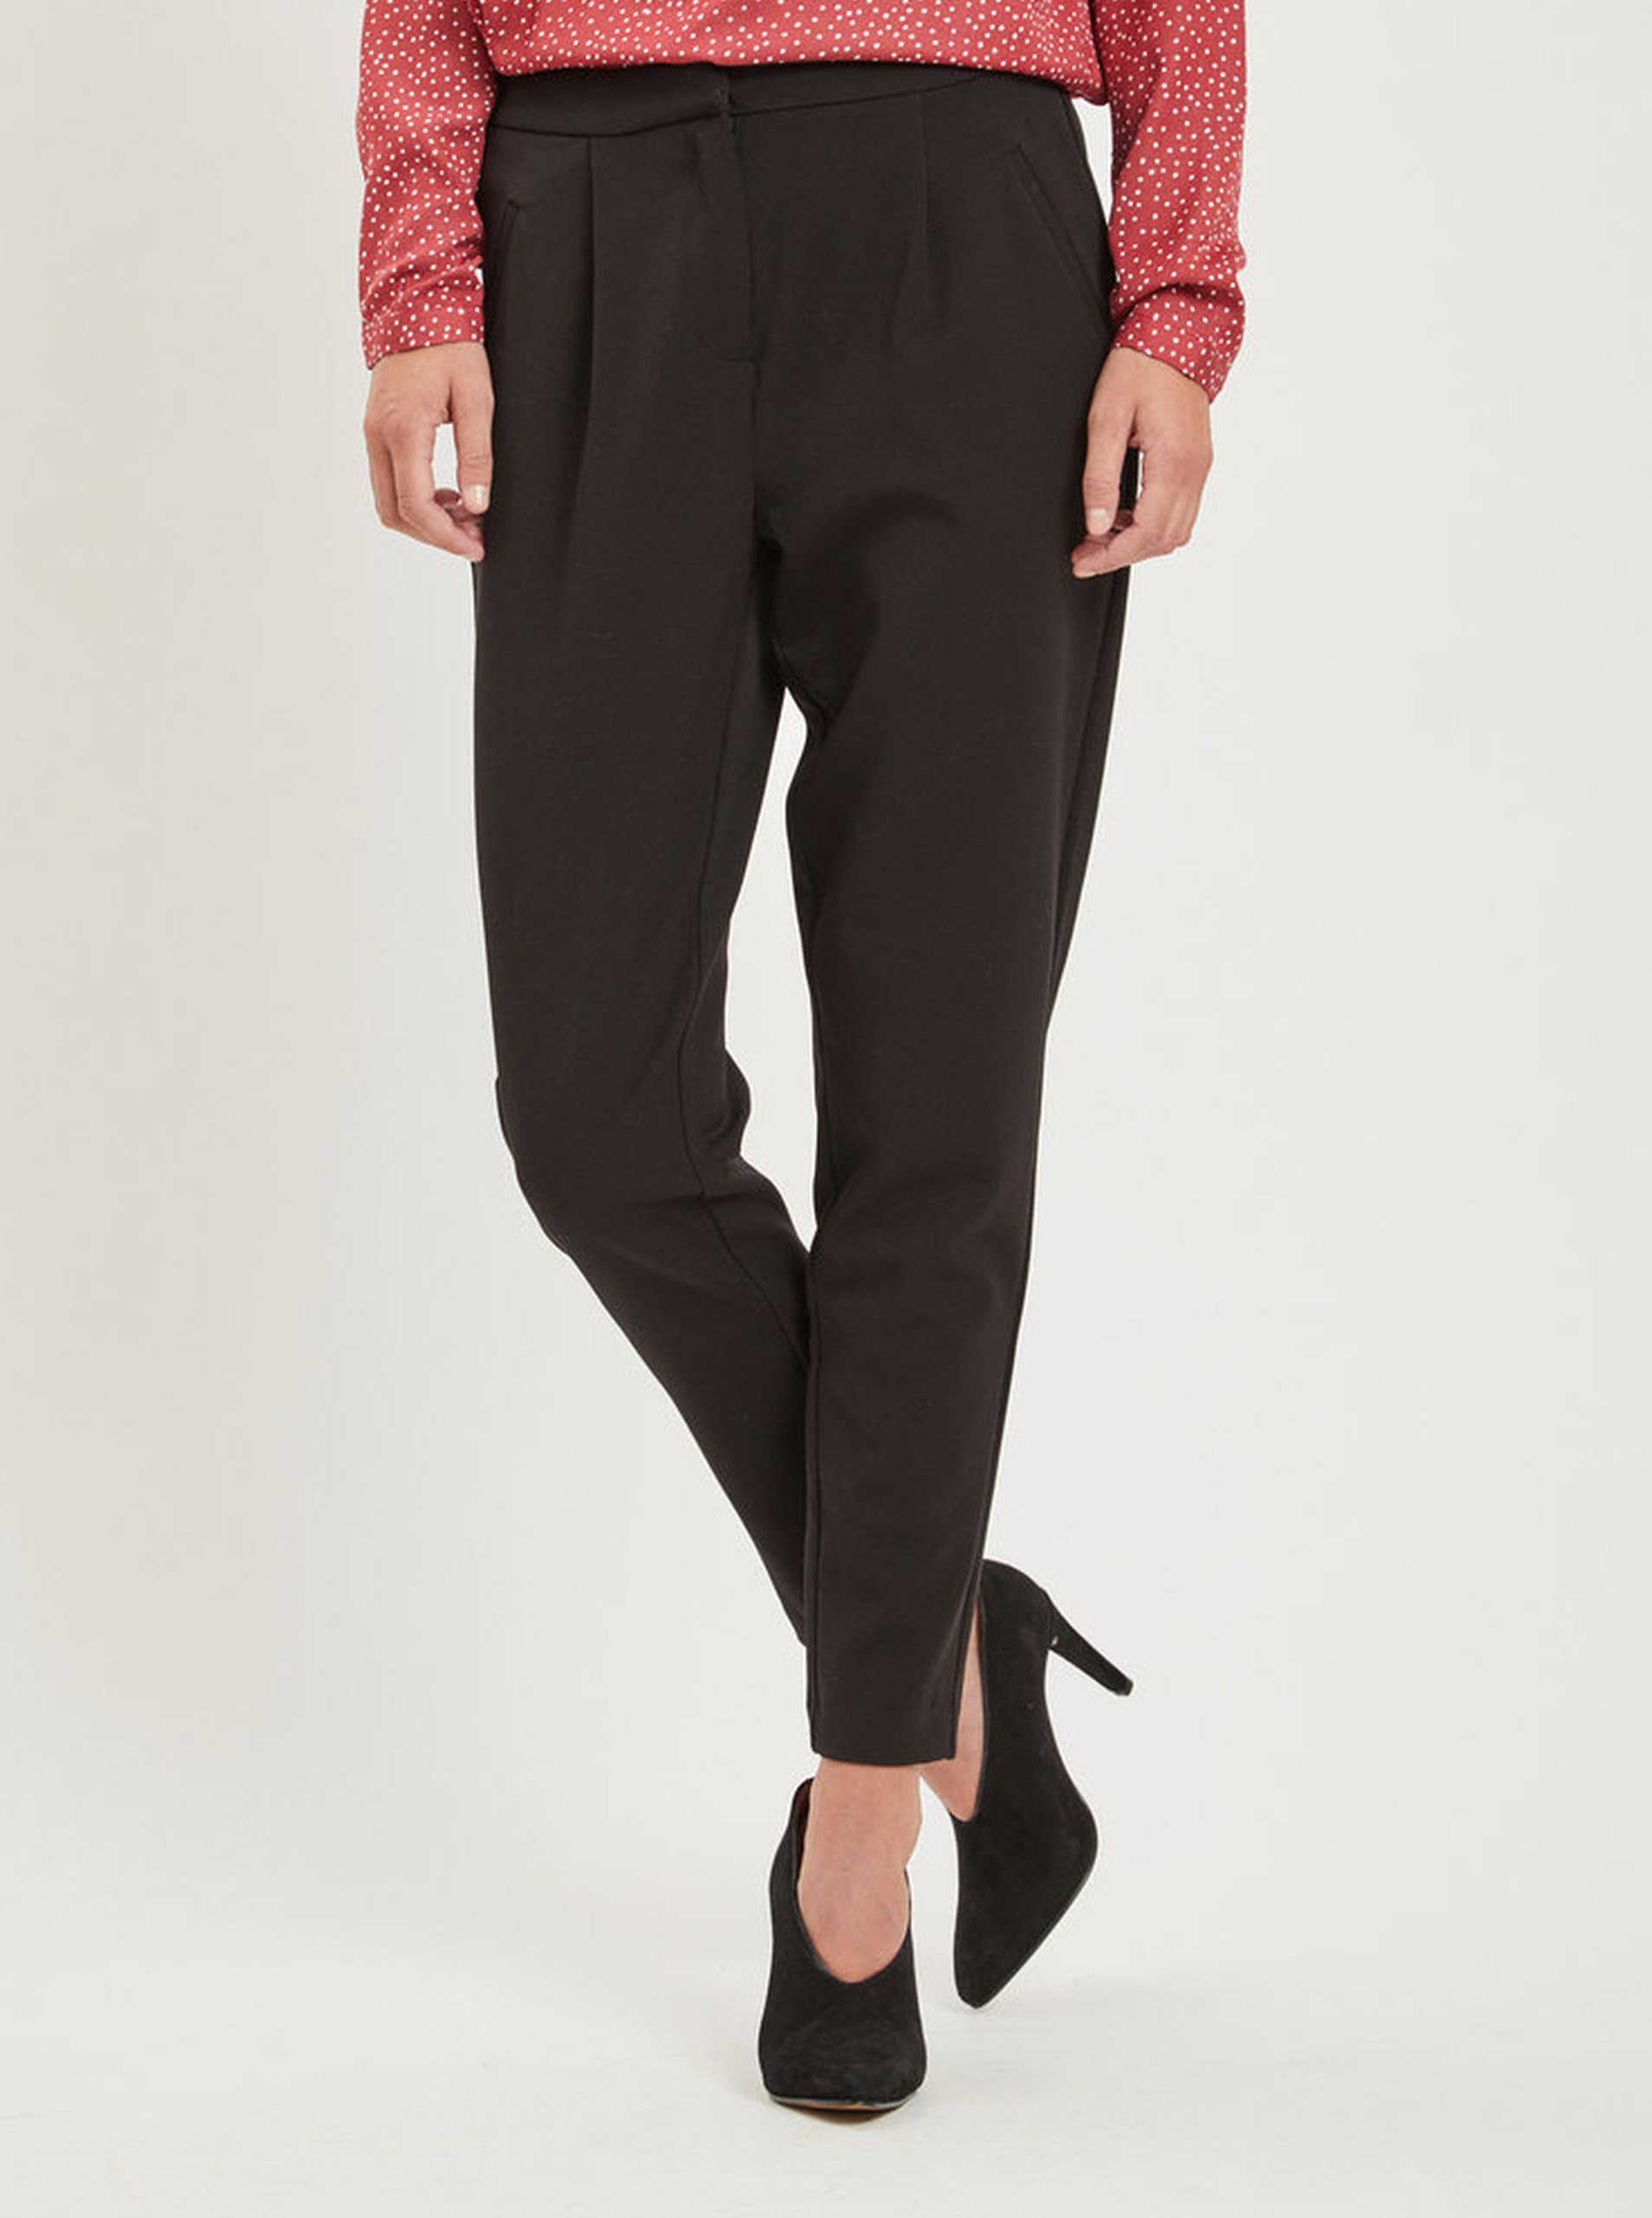 Černé kalhoty s kapsami VILA Rena ... d1dae3dba4